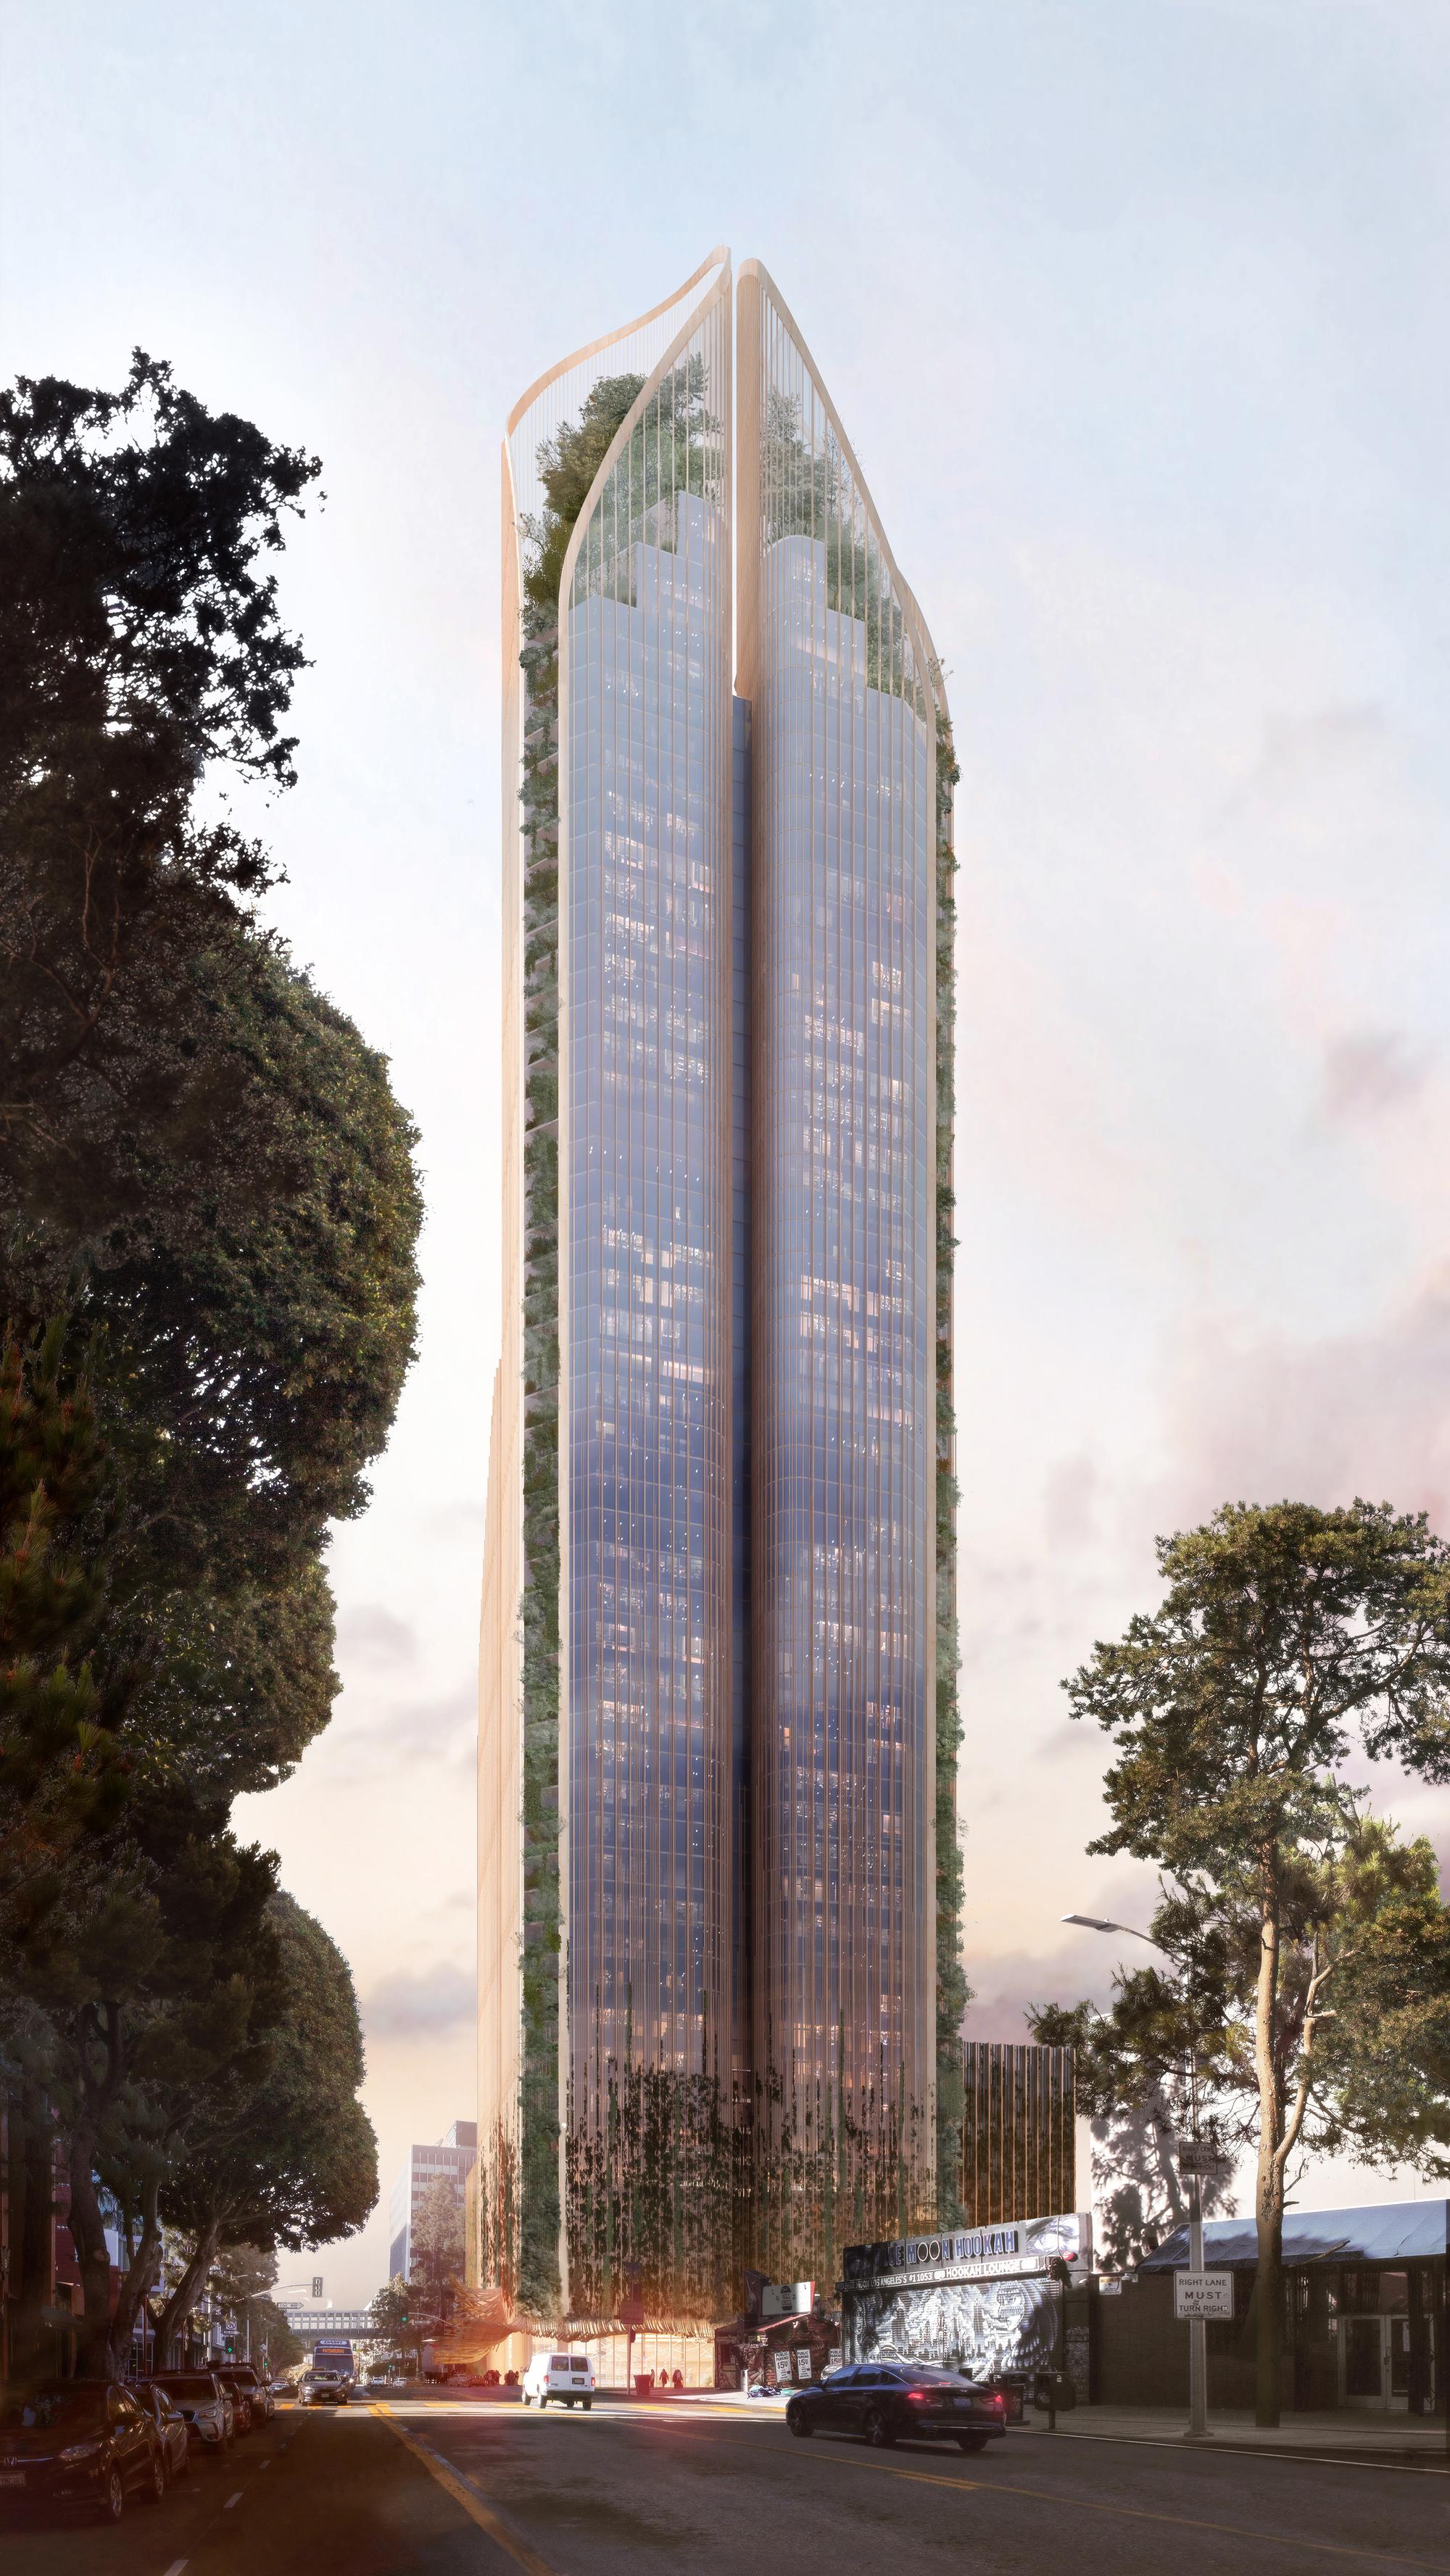 https://images.adsttc.com/media/images/5ef0/60c1/b357/658c/7f00/024e/large_jpg/01_Koichi_Takada_Architects_Sky_Trees_LA_Doug___Wolf.jpg?1592811687